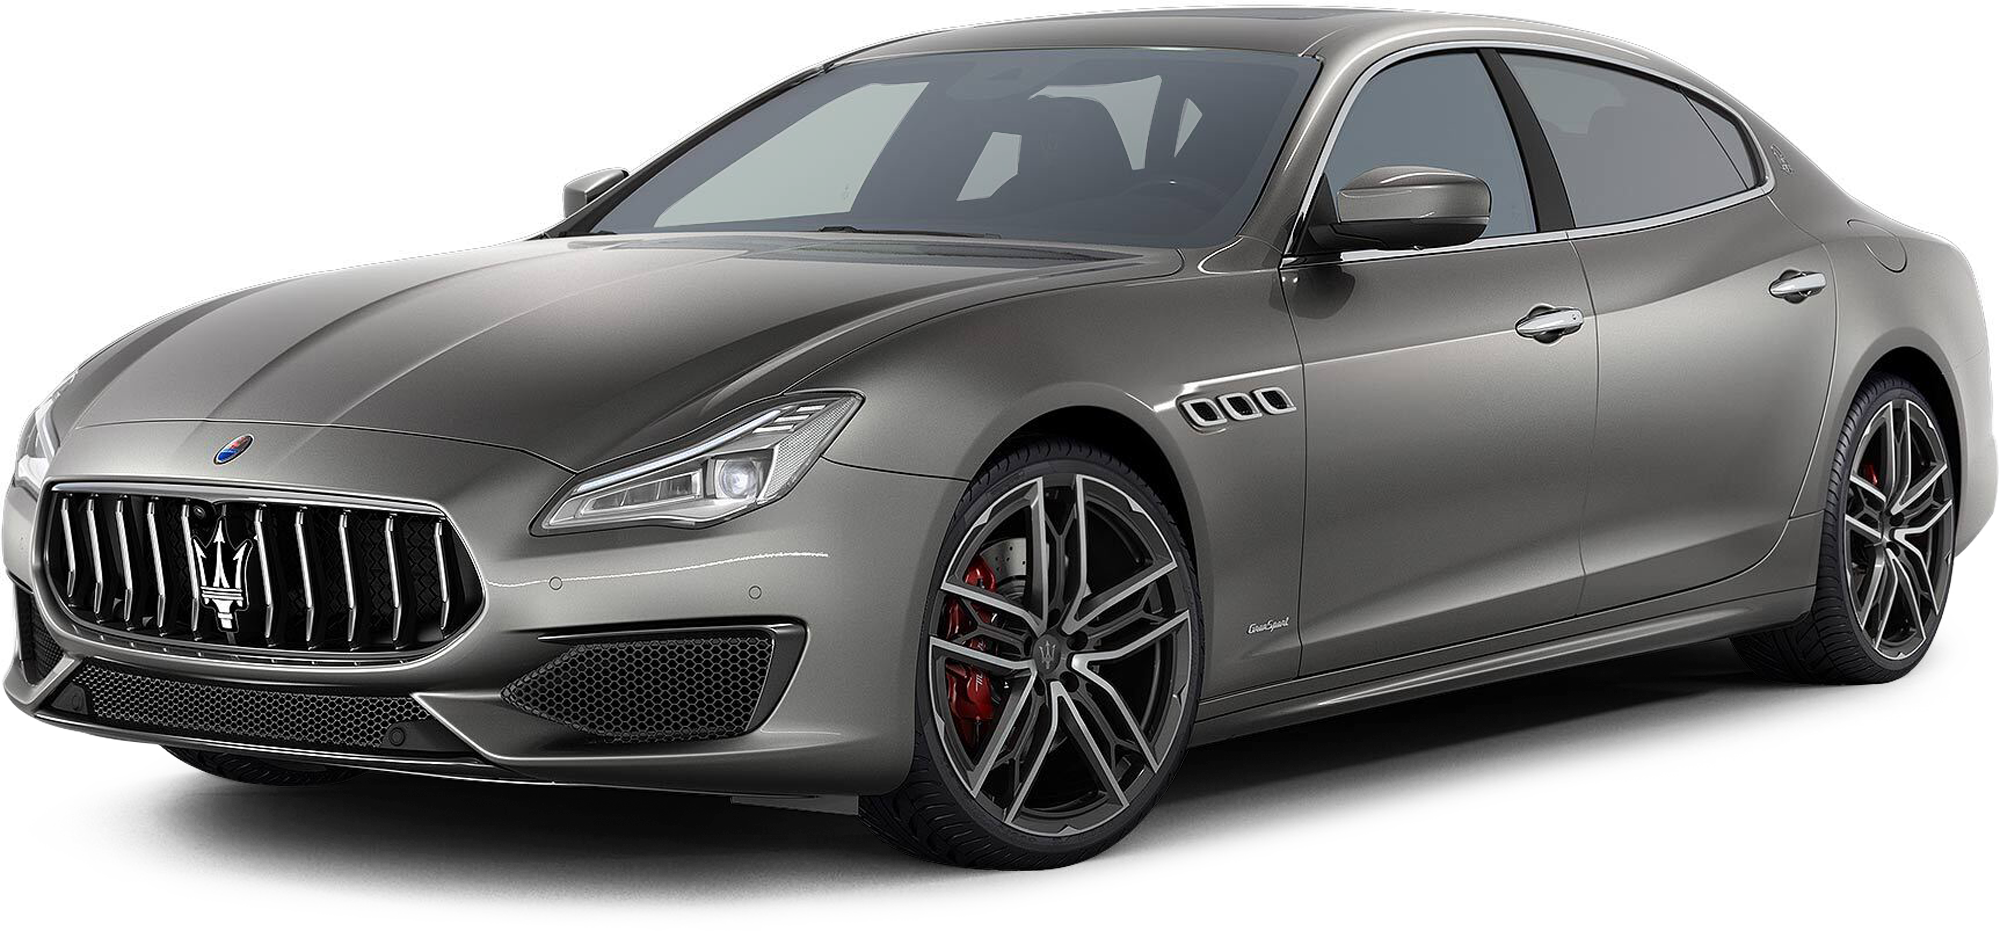 2021 Maserati Quattroporte Incentives, Specials & Offers in Walnut Creek CA